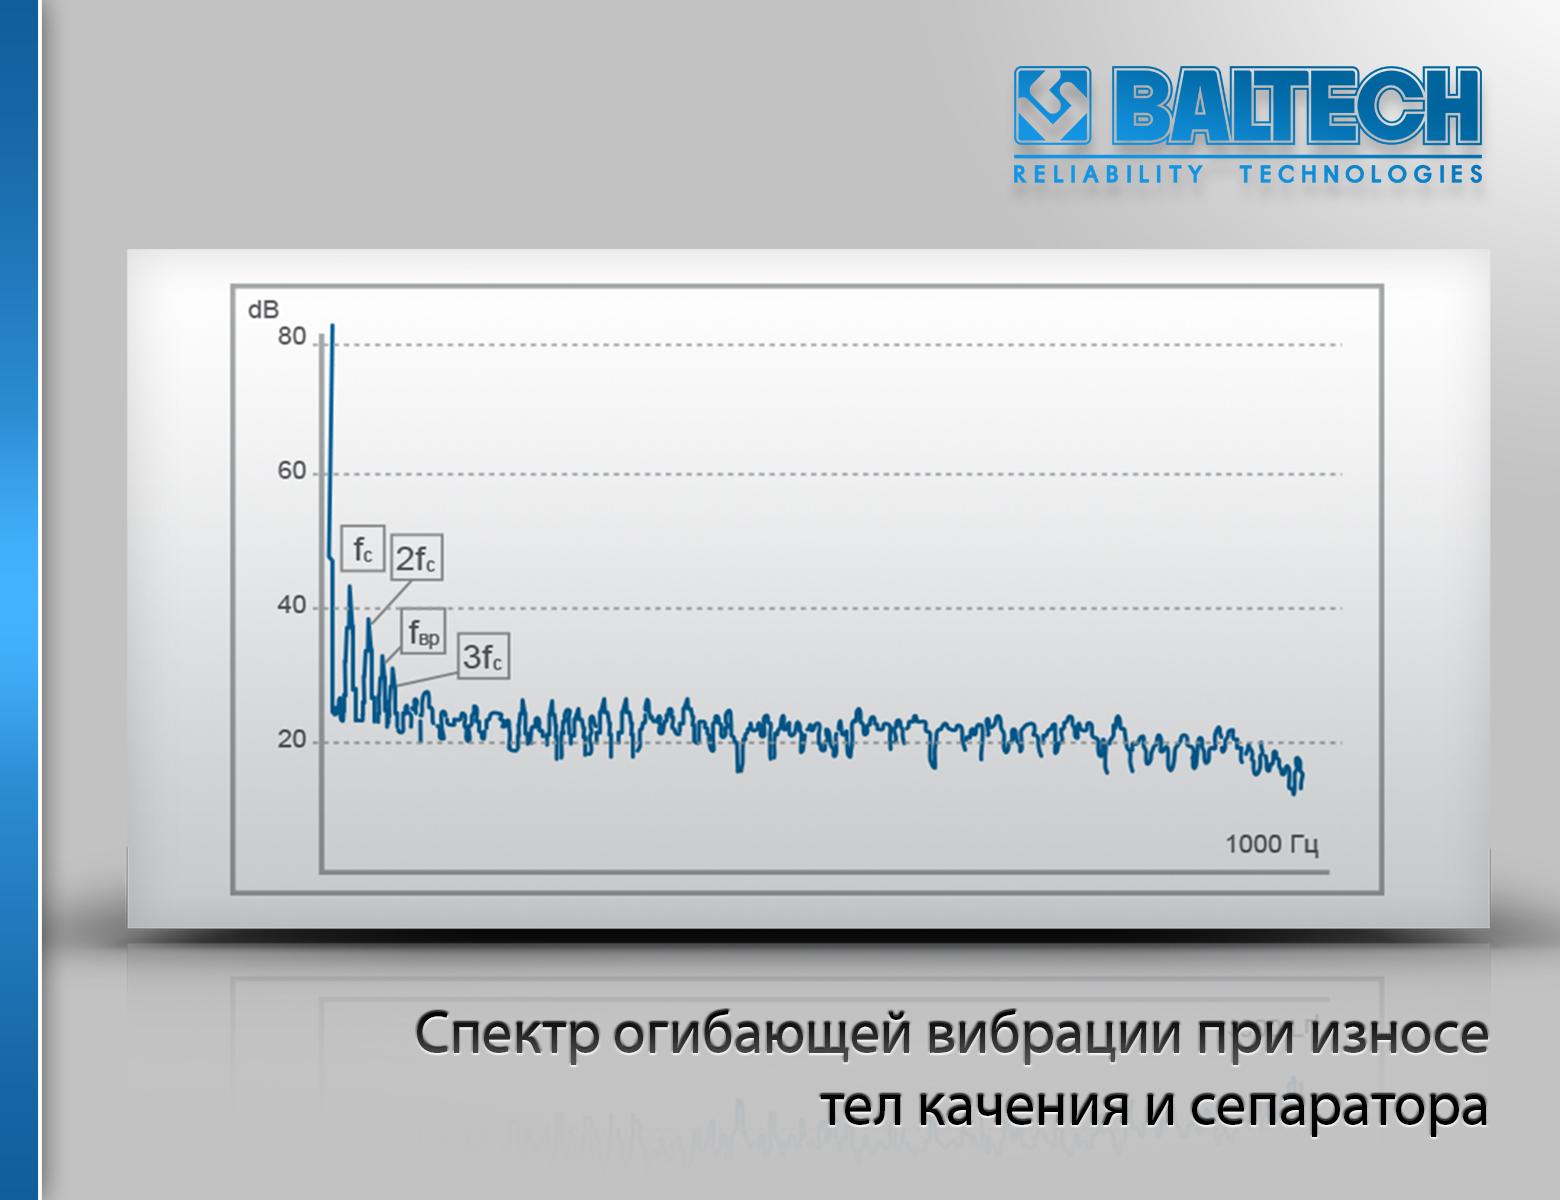 Спектр огибающей вибрации при износе тел качения и сепаратора, диагностика подшипников